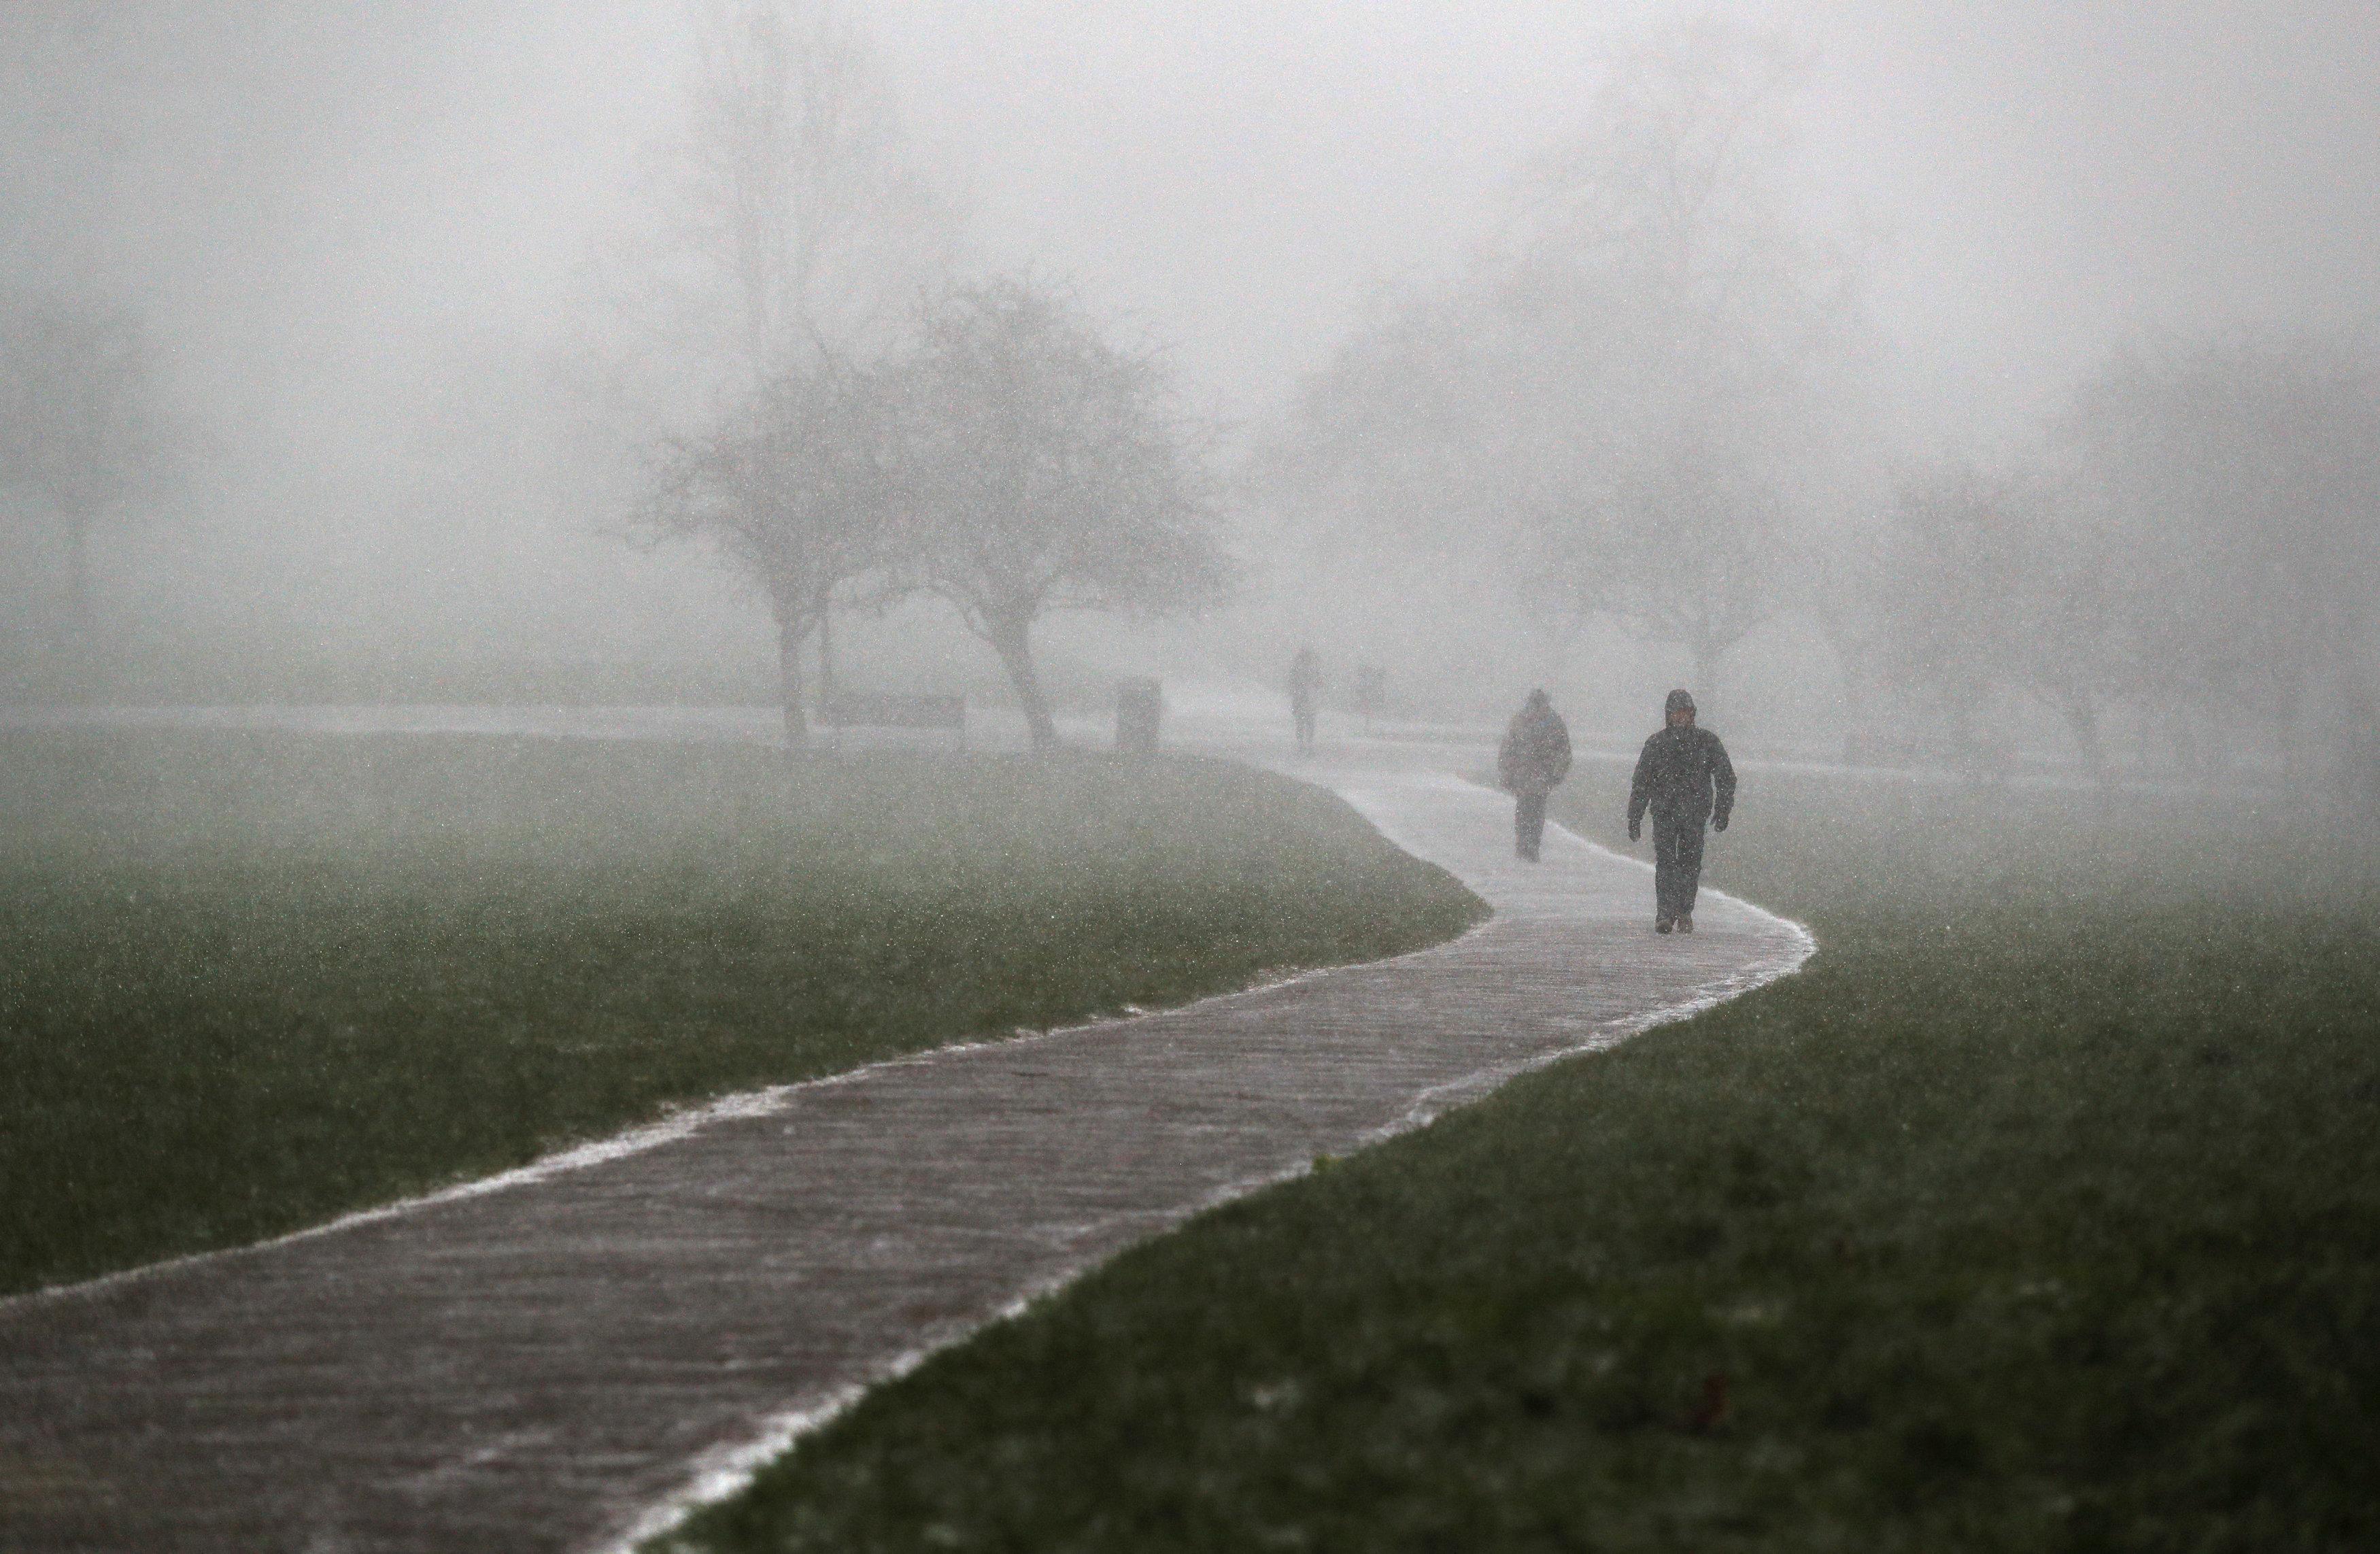 Nieve enPrimrose Hill en Londres (REUTERS/Peter Nicholls)